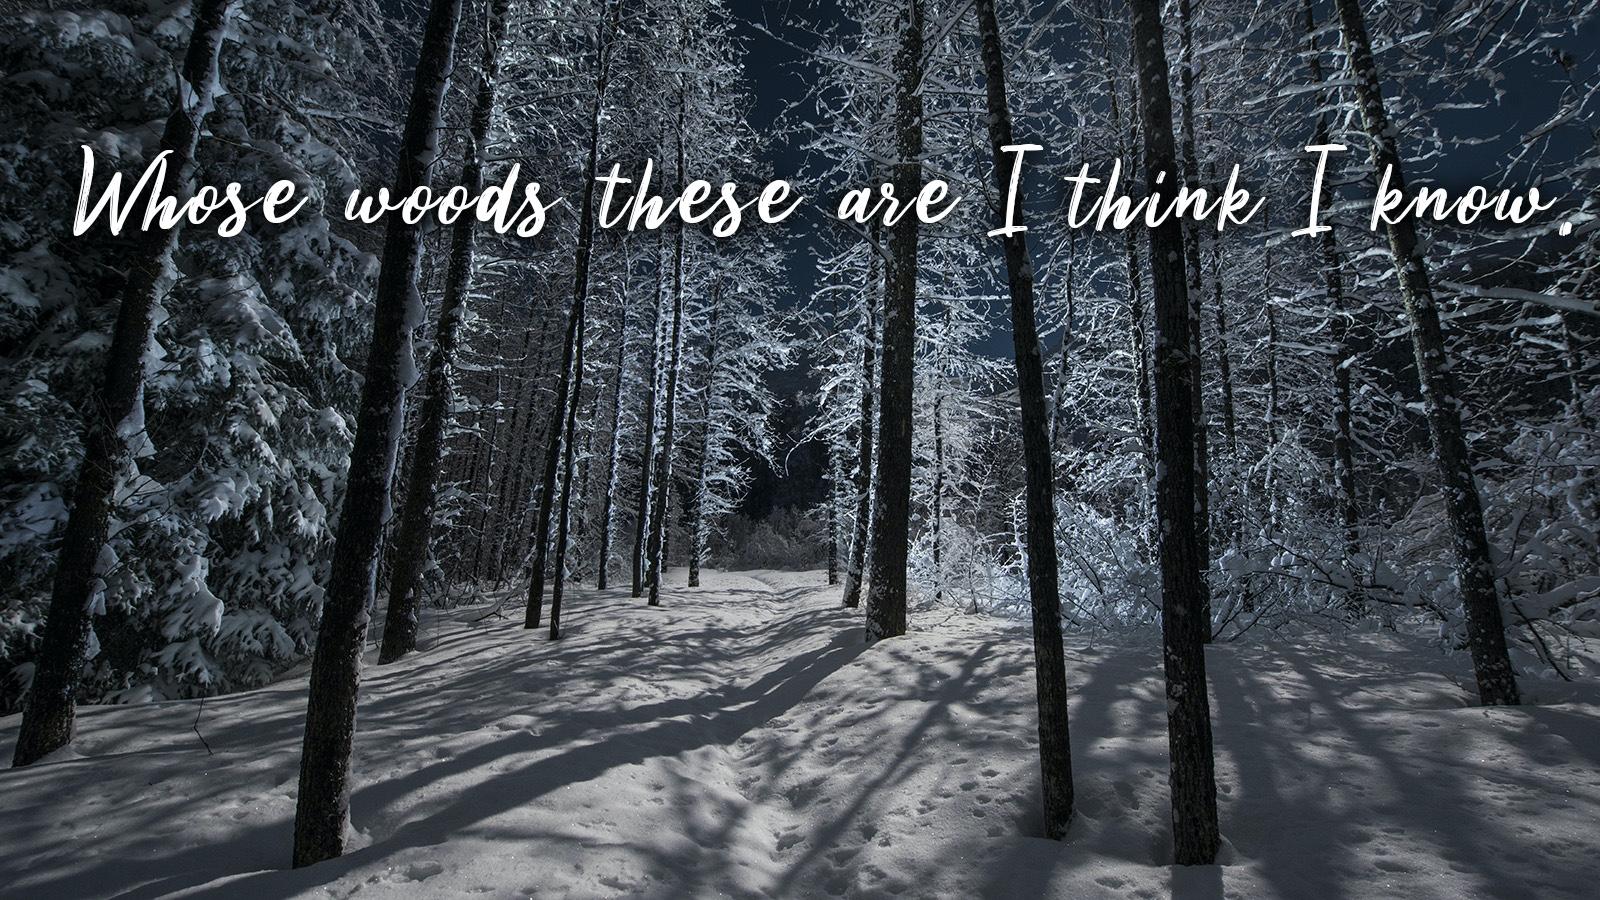 snowy wood poem Robert Frost